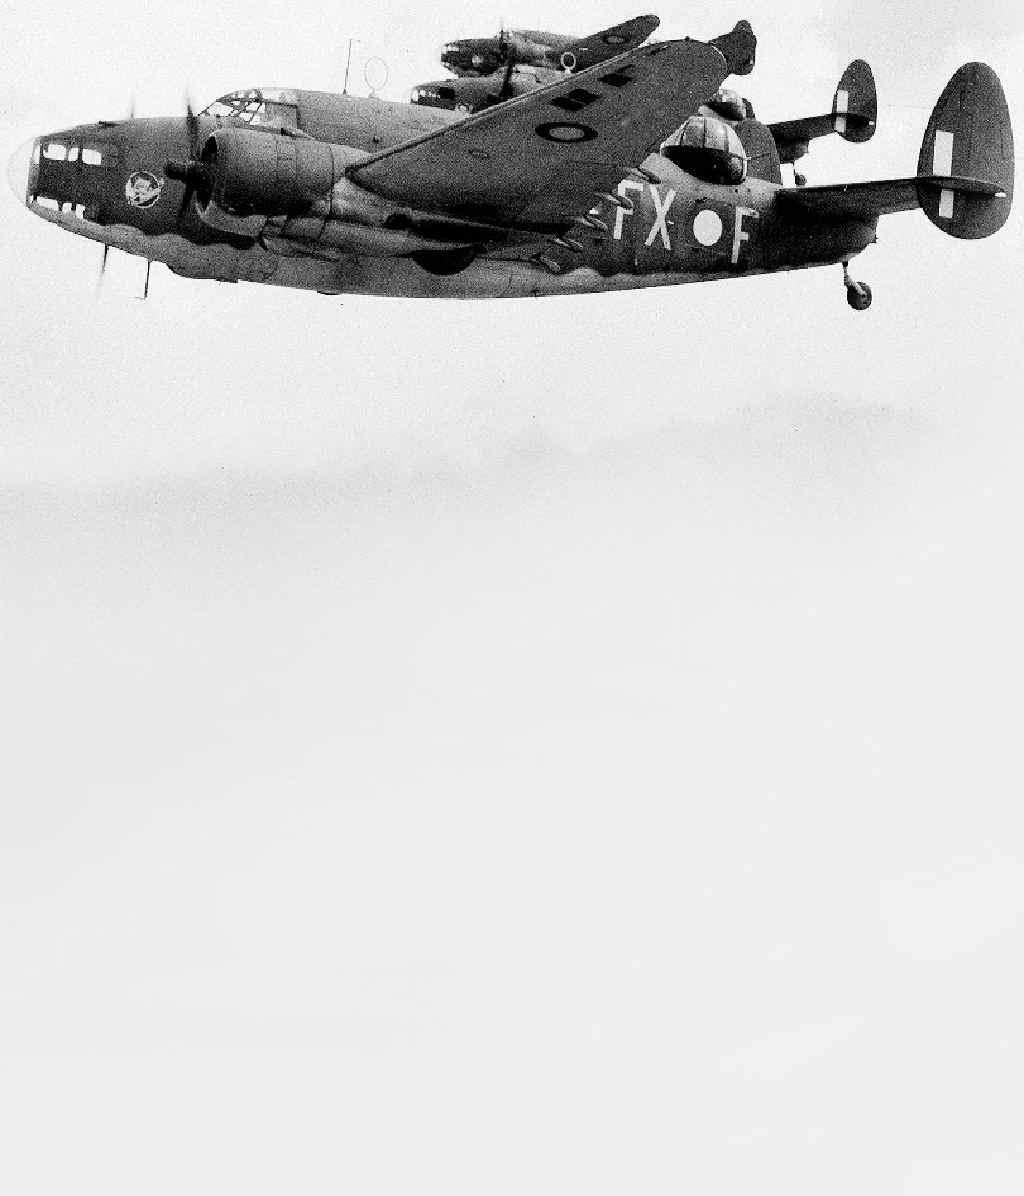 IN LINE: RAAF Lockheed Hudson bombers.